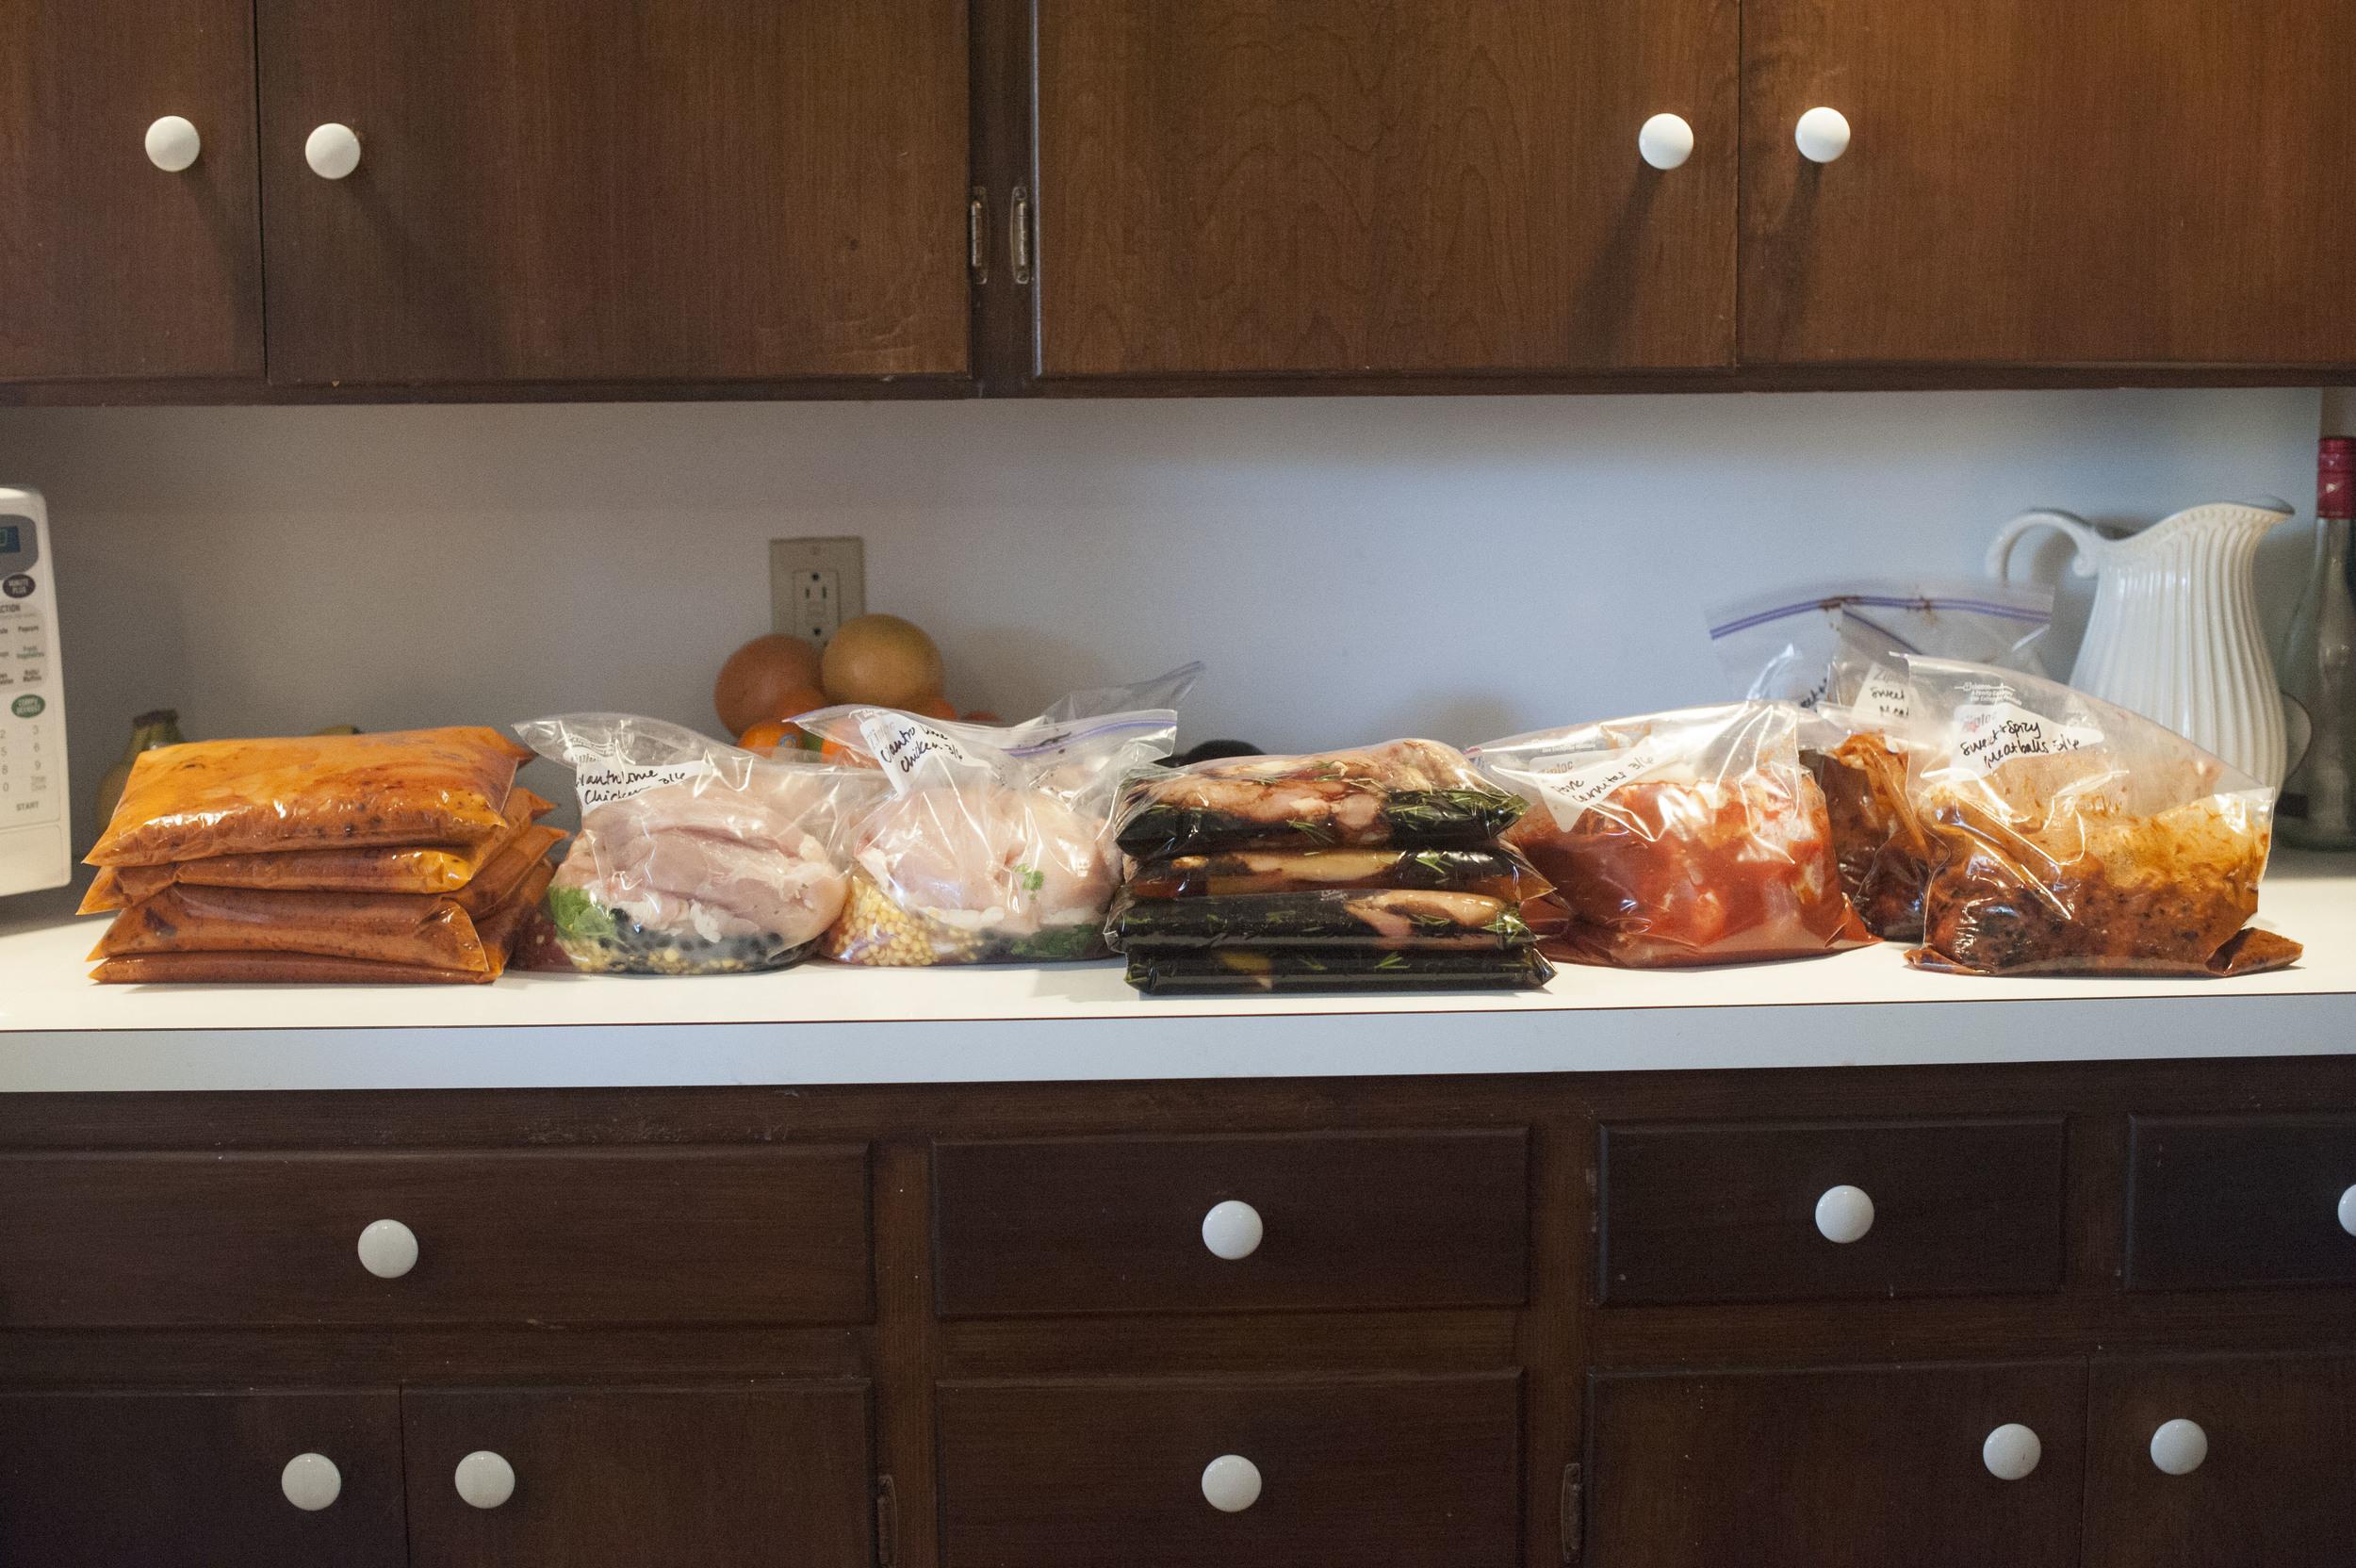 Finished freezer meals!